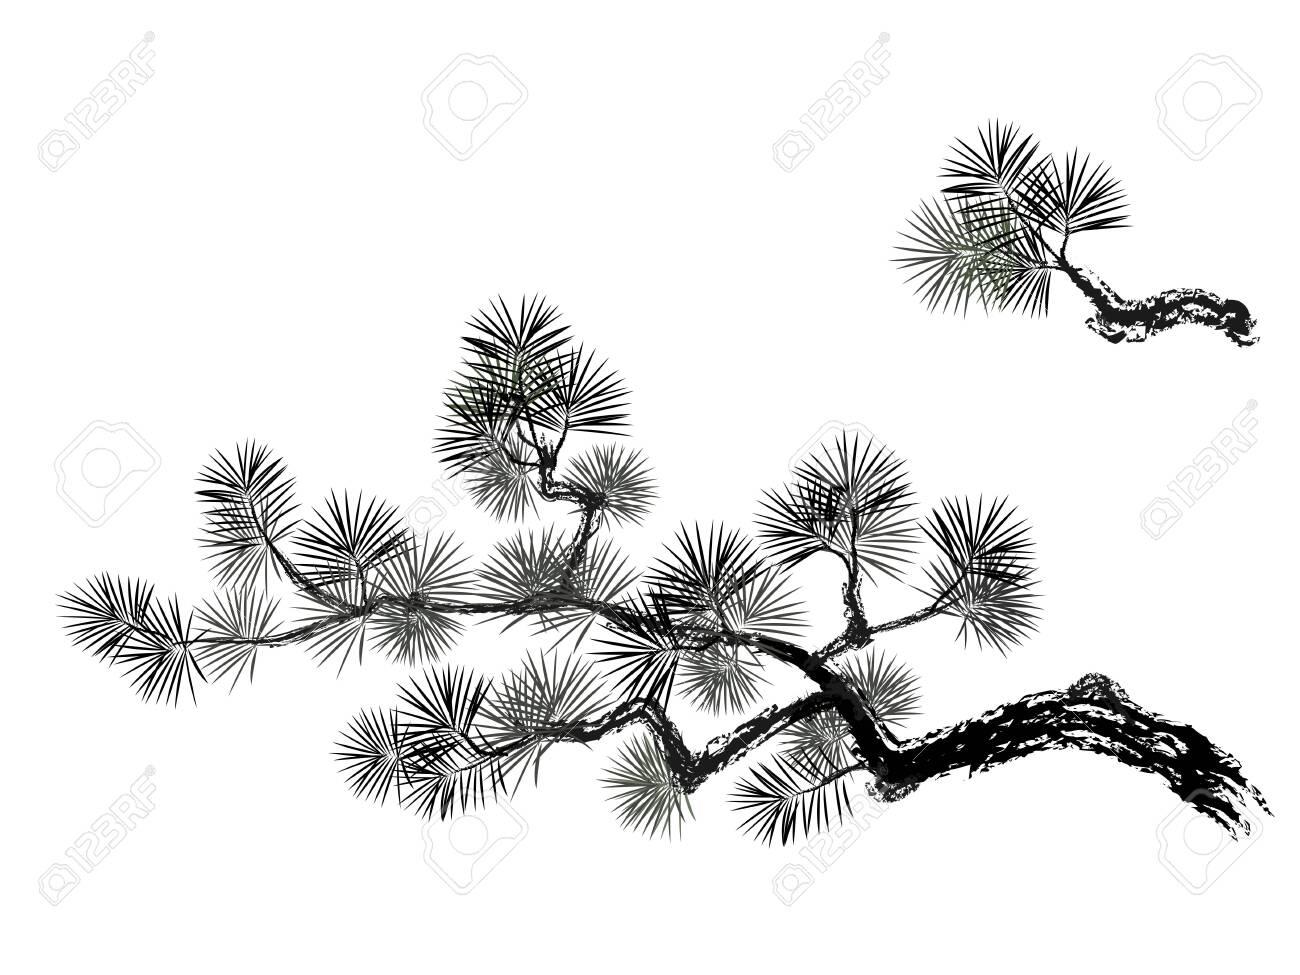 Vector illustration of pain tree - 124531603